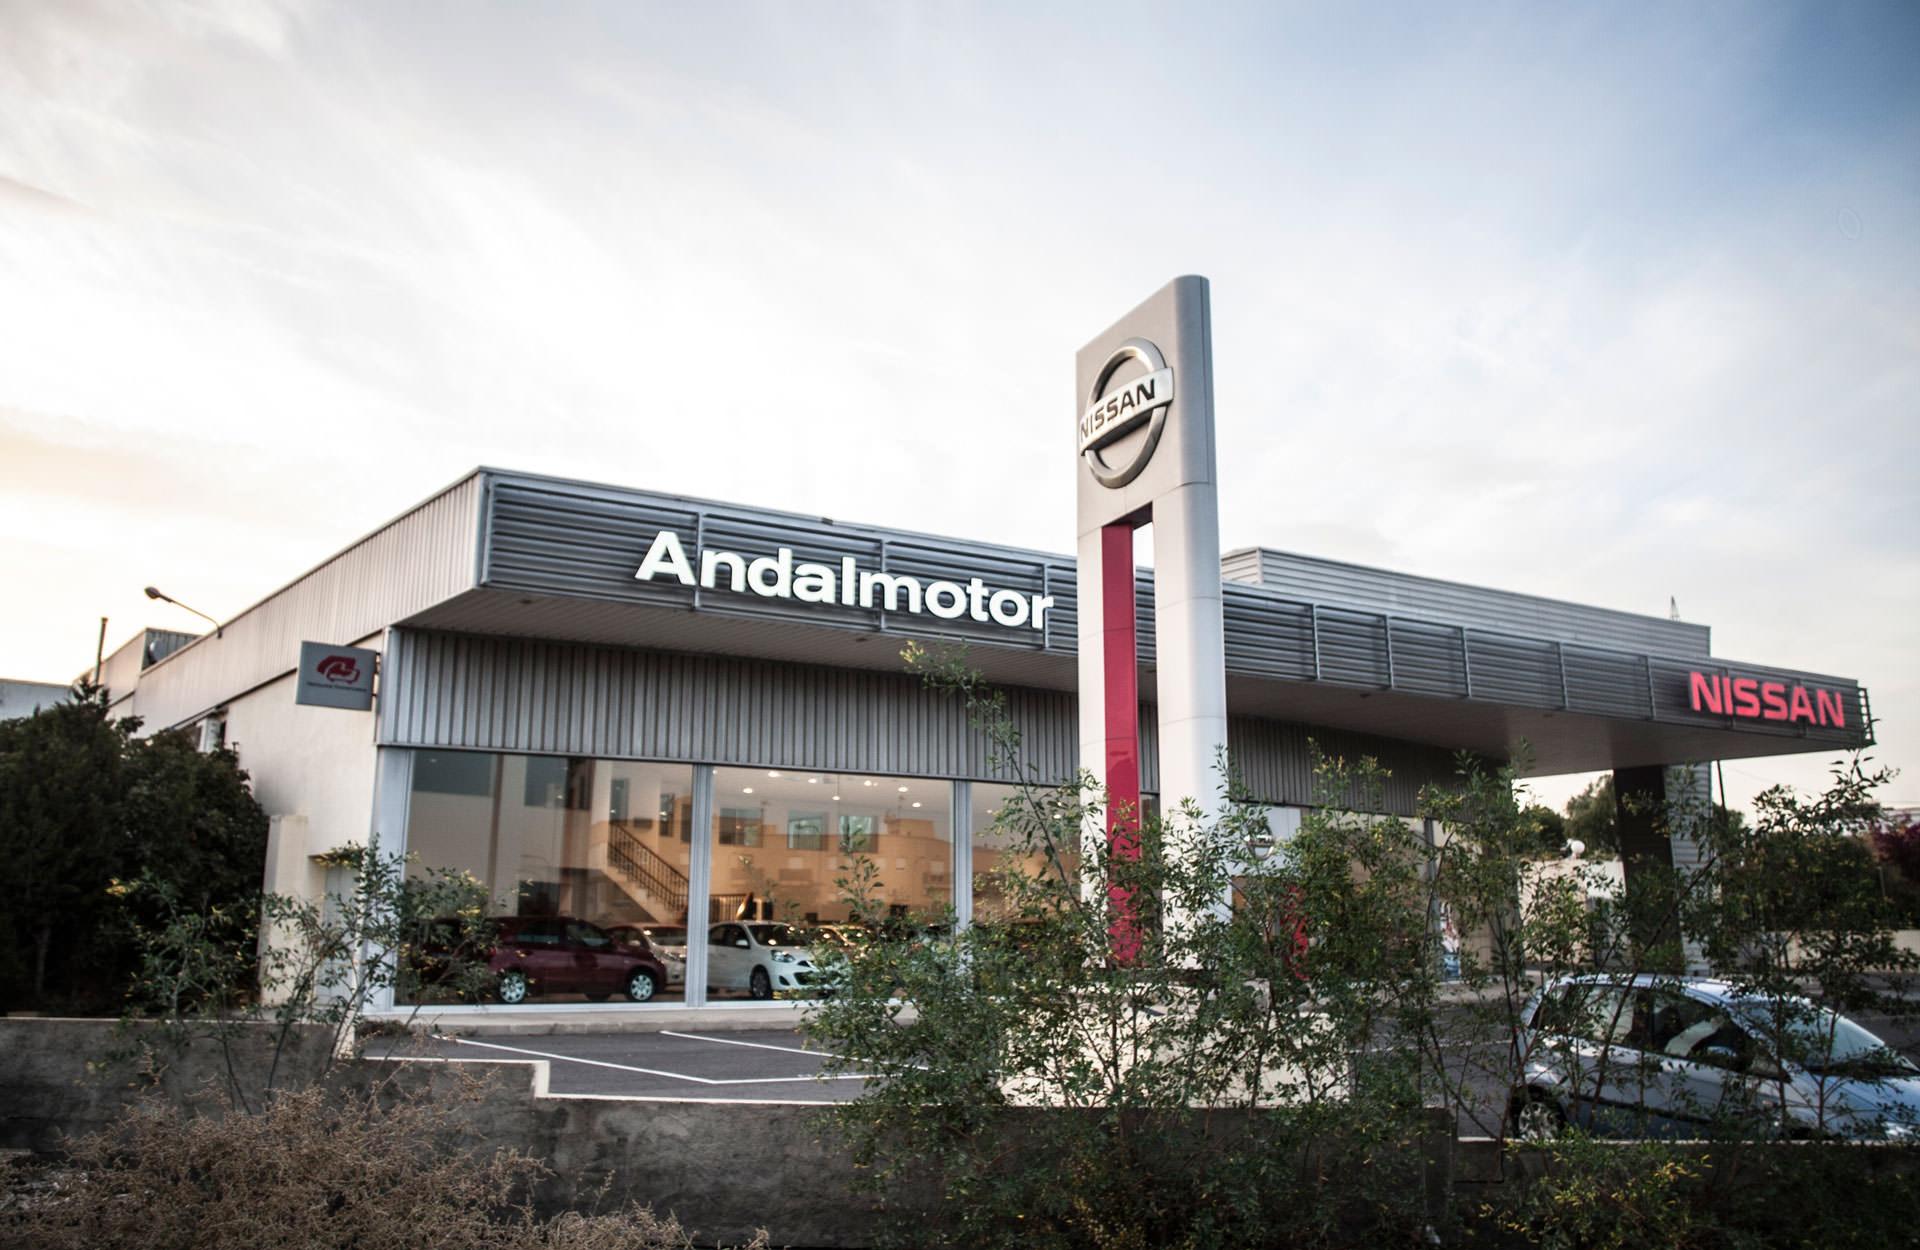 Concesionario - ANDALMOTOR - Nissan